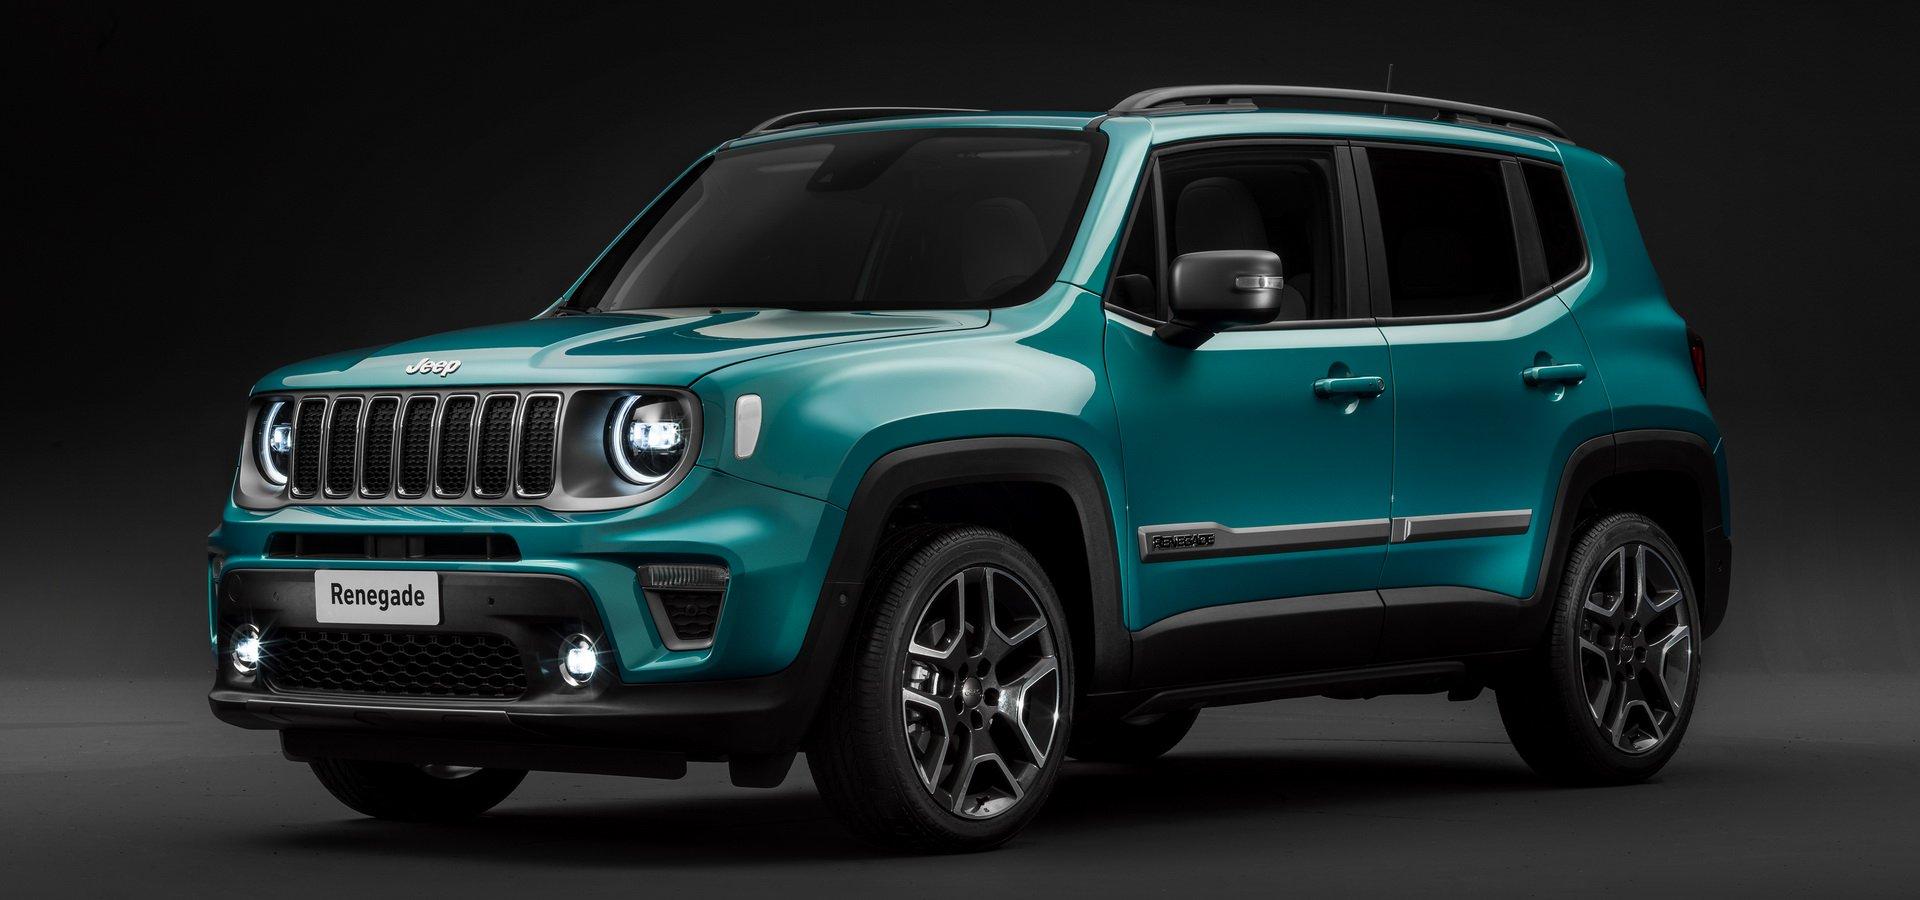 Jeep Renegade Limited >> Jeep Announces 2019 Geneva Motor Show Lineup - autoevolution